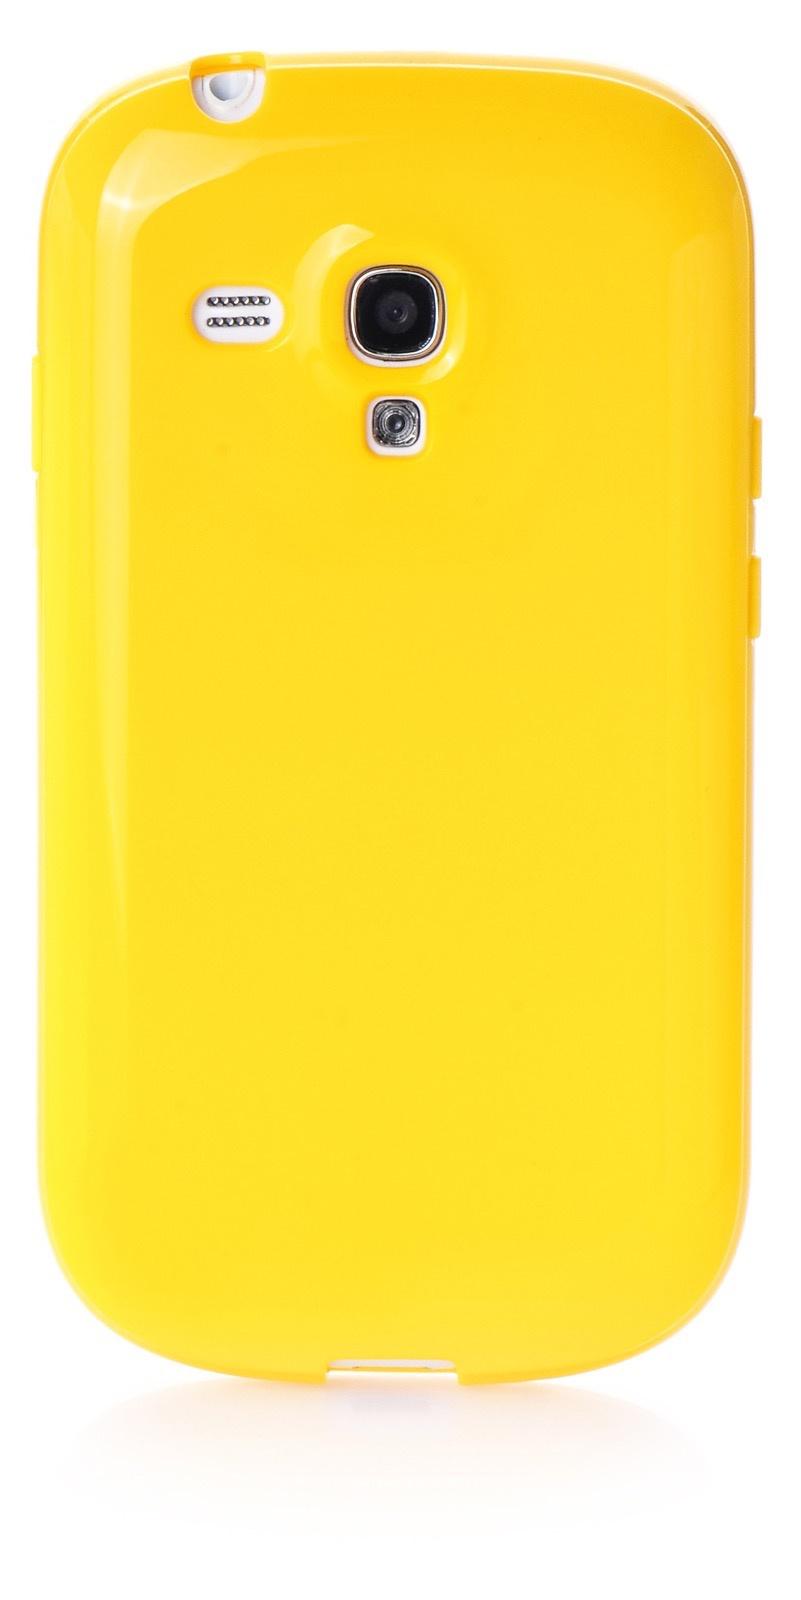 Чехол для Samsung Galaxy S3 mini накладка силикон мыльница yellow для Samsung Galaxy S3 mini